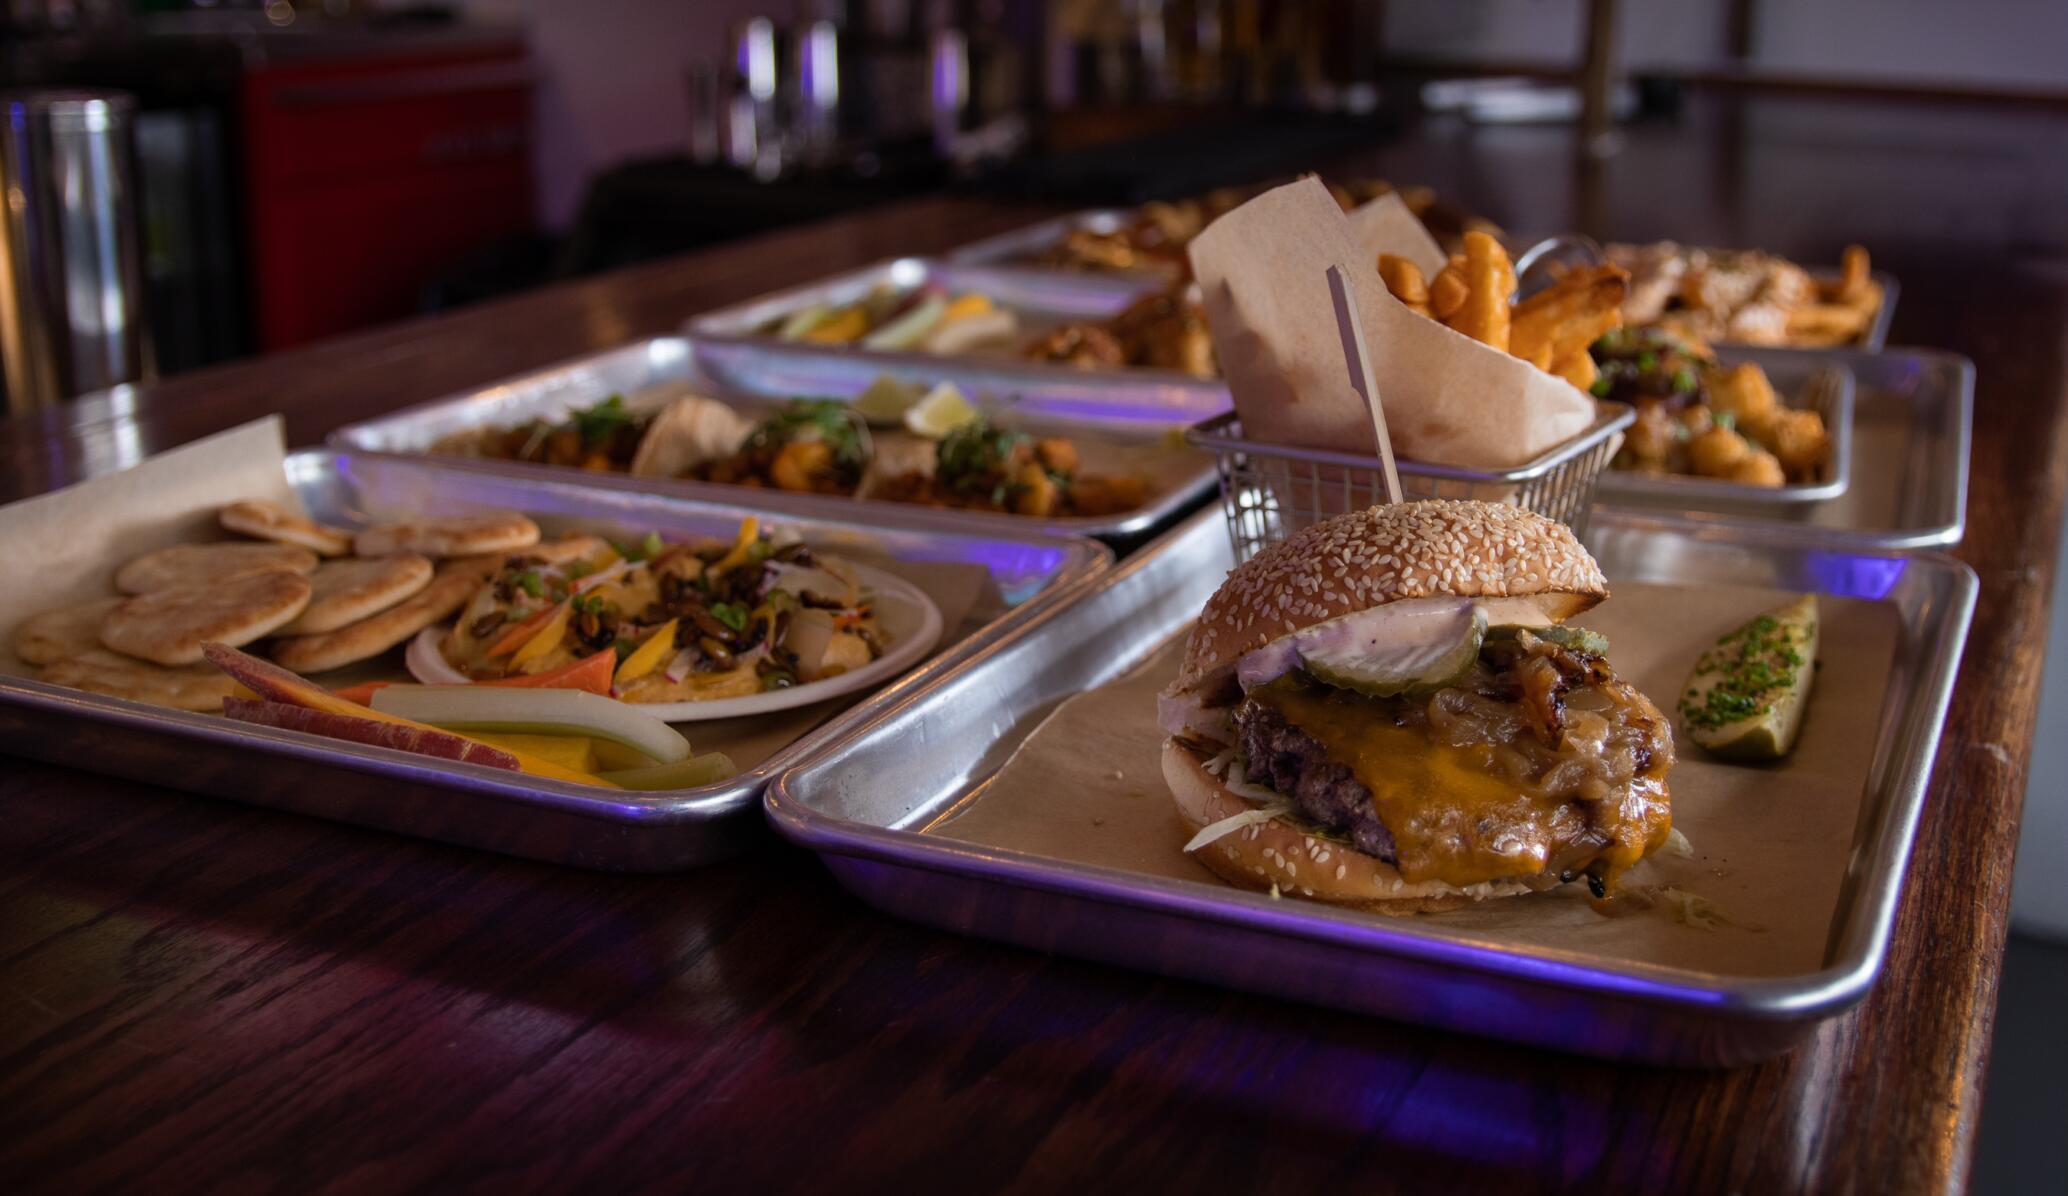 plates of food at a bar including a burger